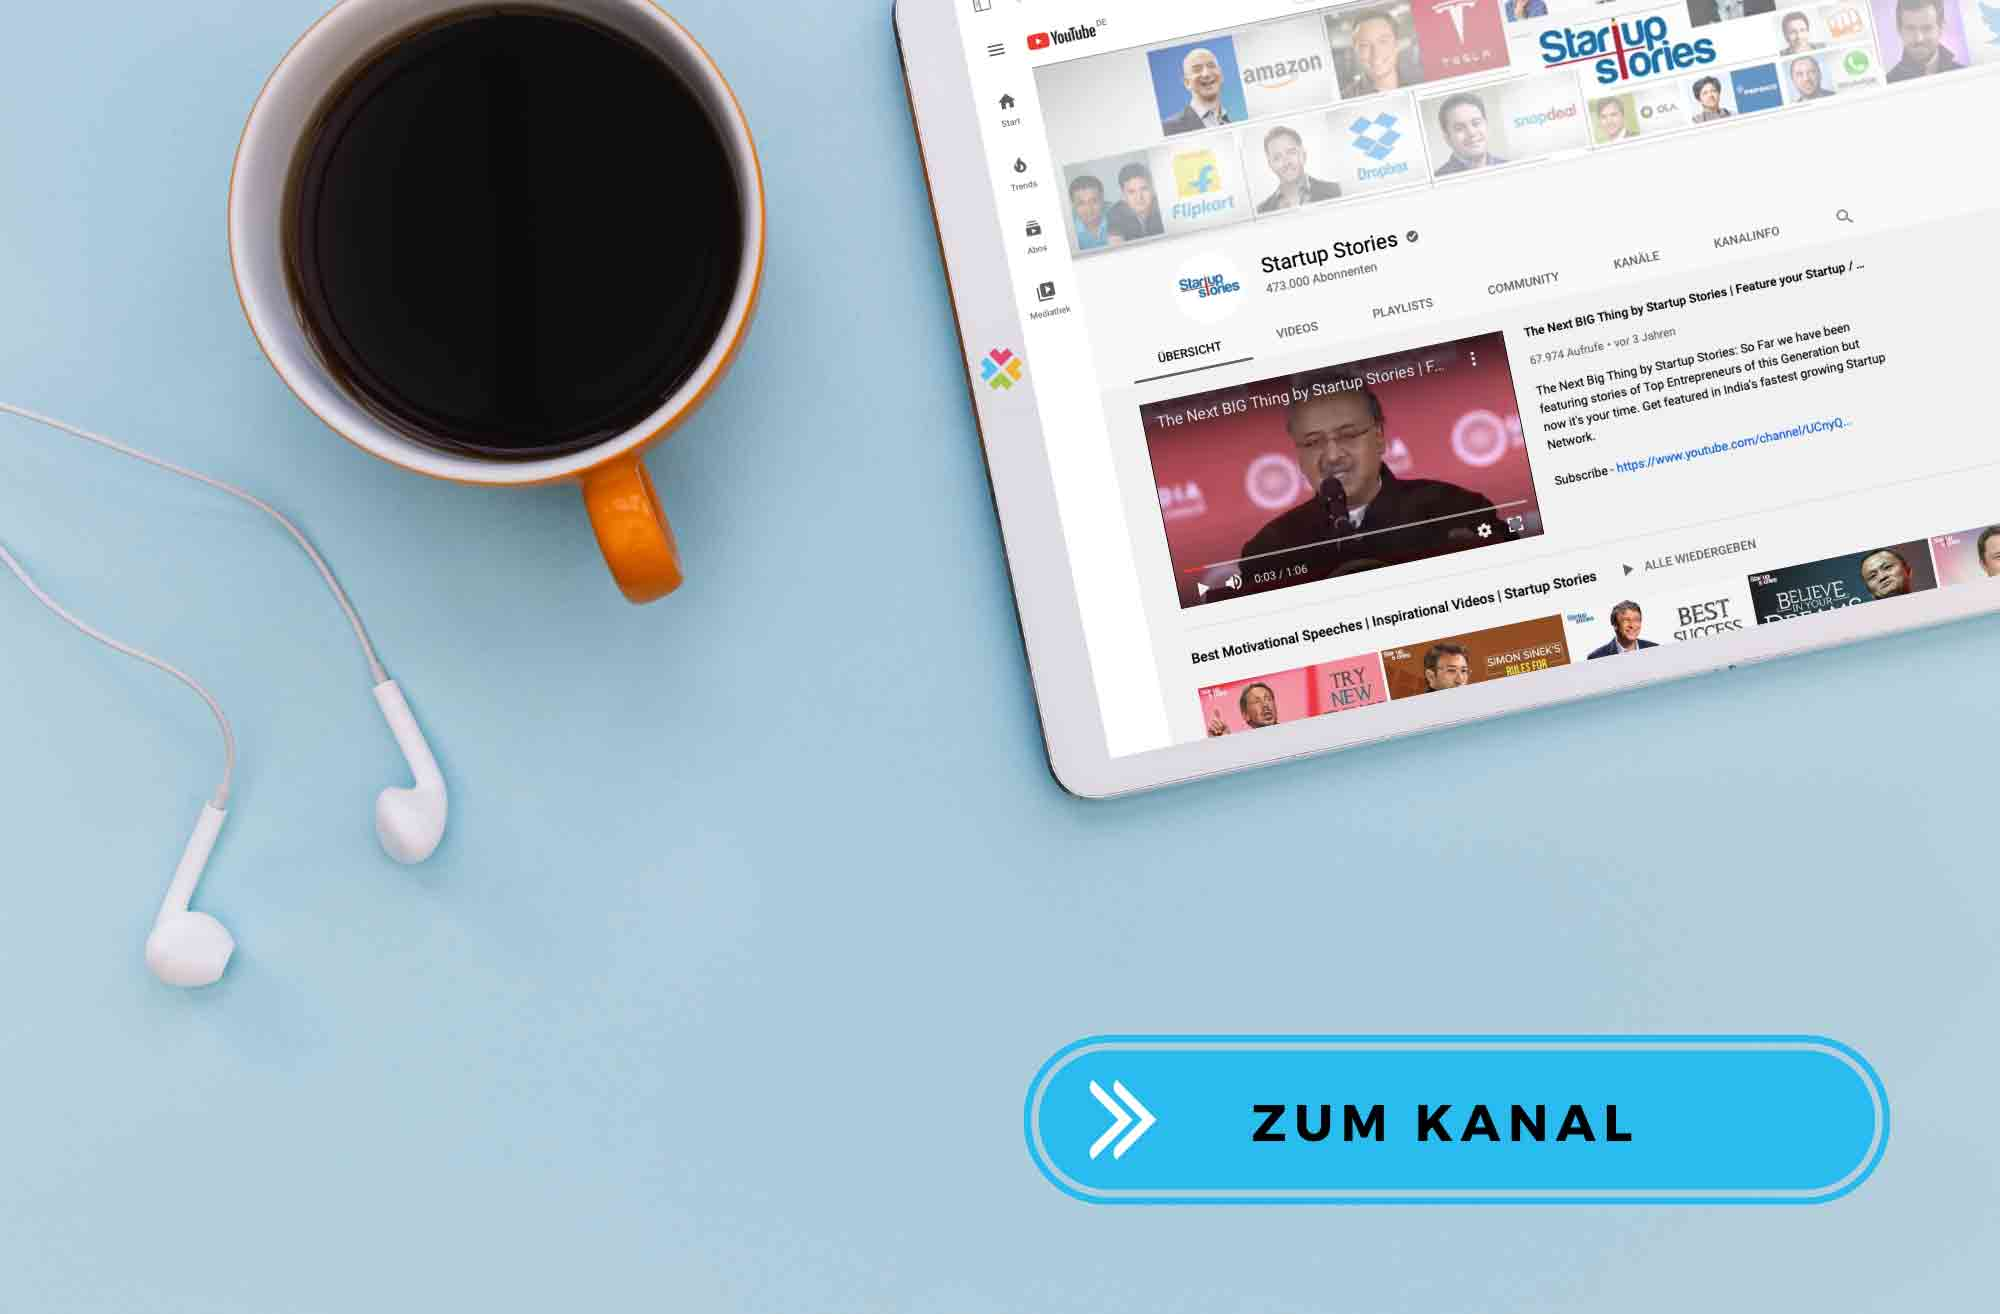 DIGITALHUB.DE YouTube Startup Stories